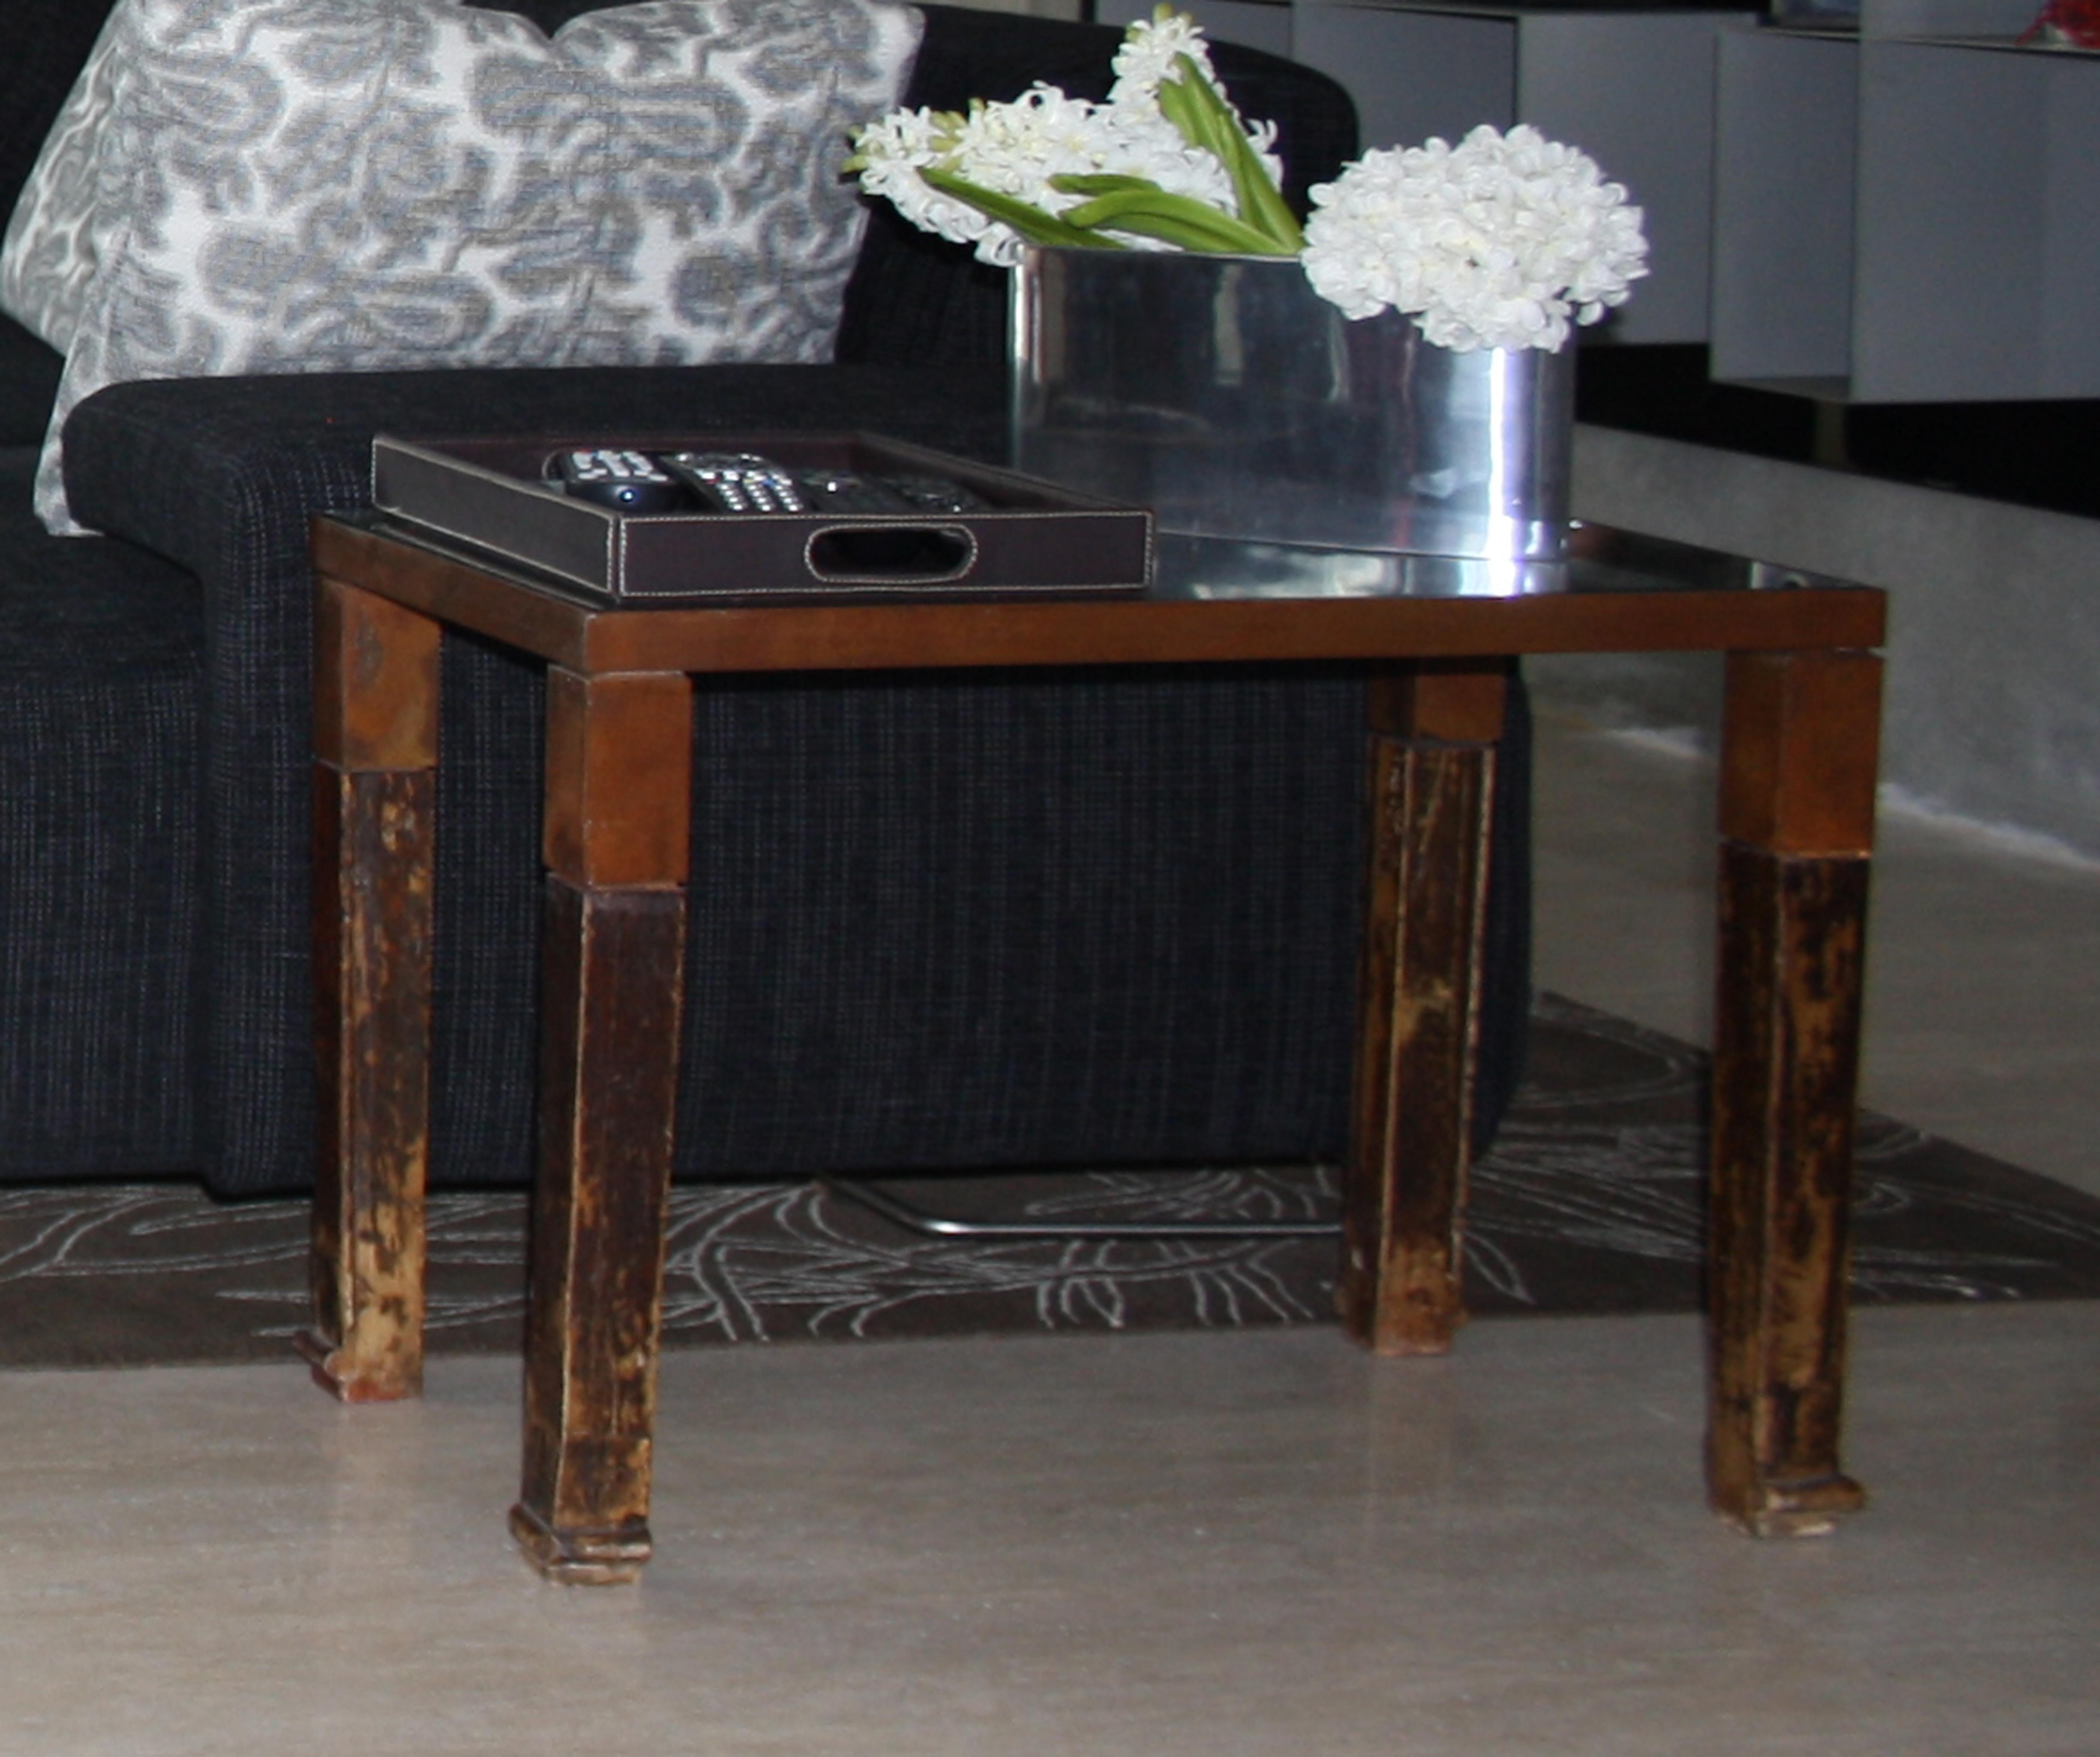 Blog alicia mesa part 4 - Mesas de centro que se elevan ...